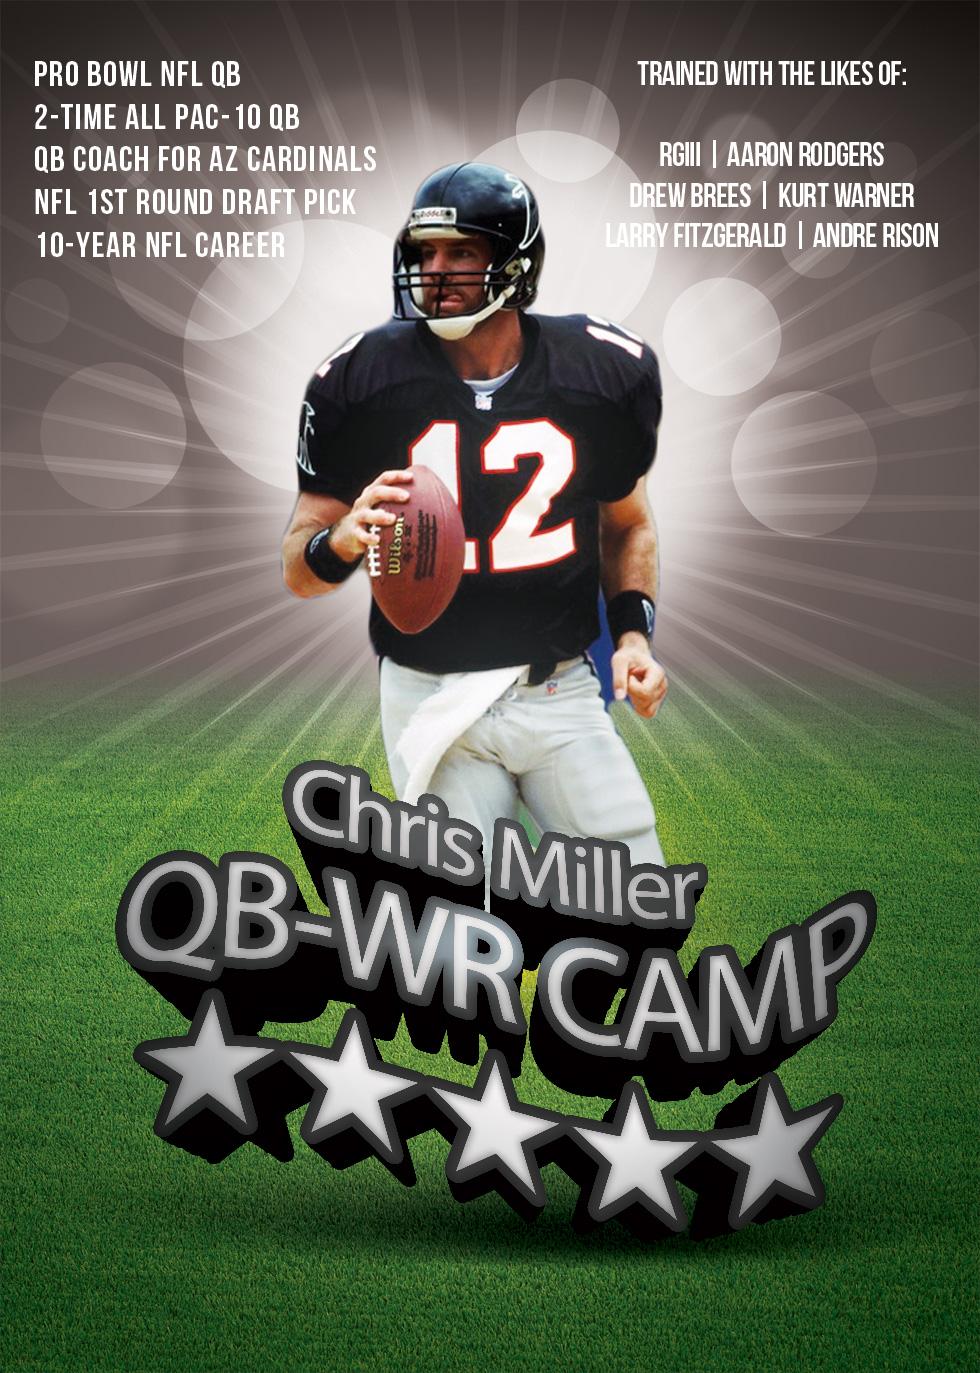 Chris miller qb camp generic